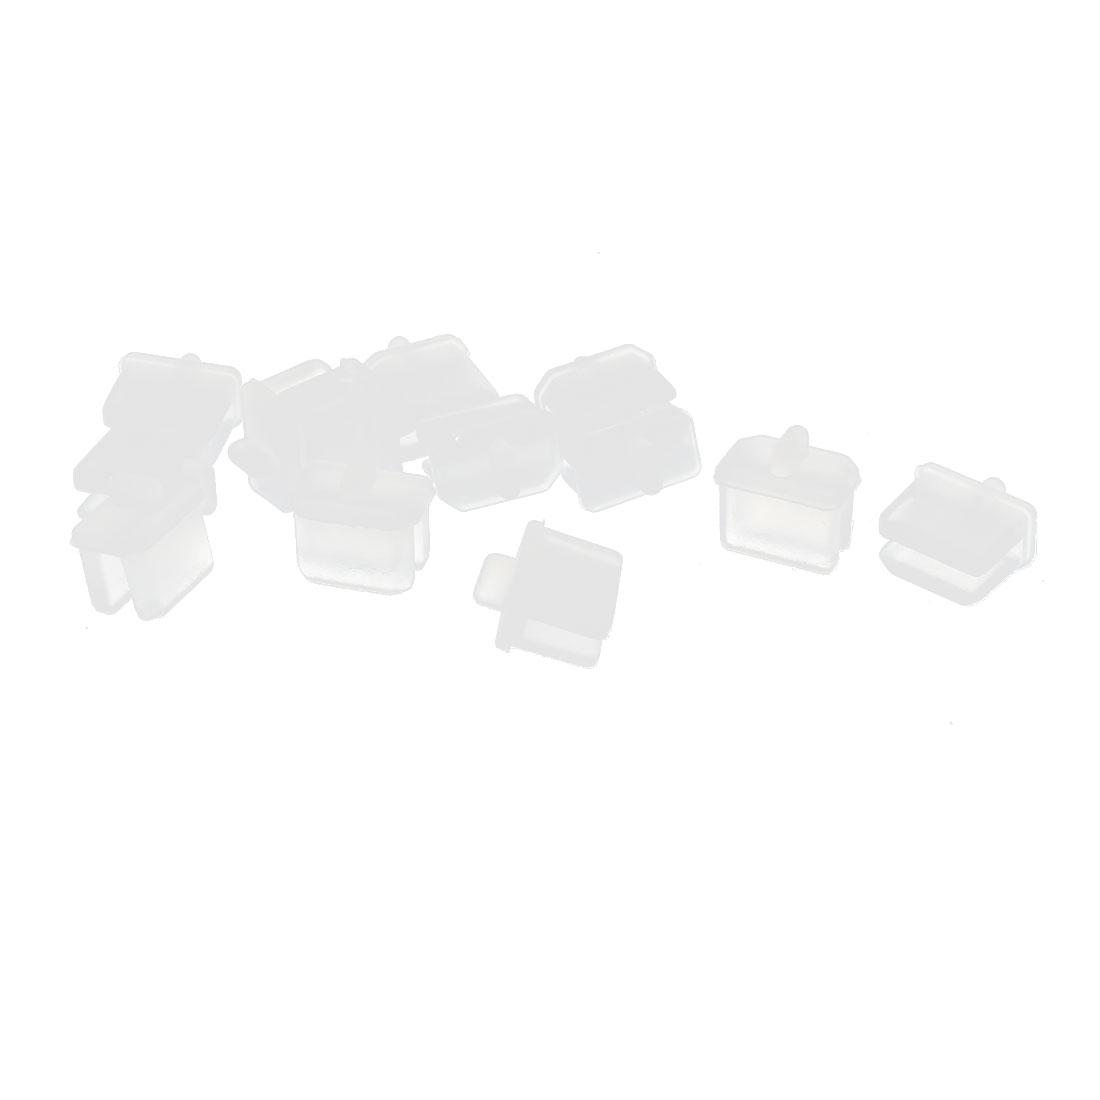 10 Pcs White Anti Dust Cover Cap Protector for Mini Displayport Thunderbolt